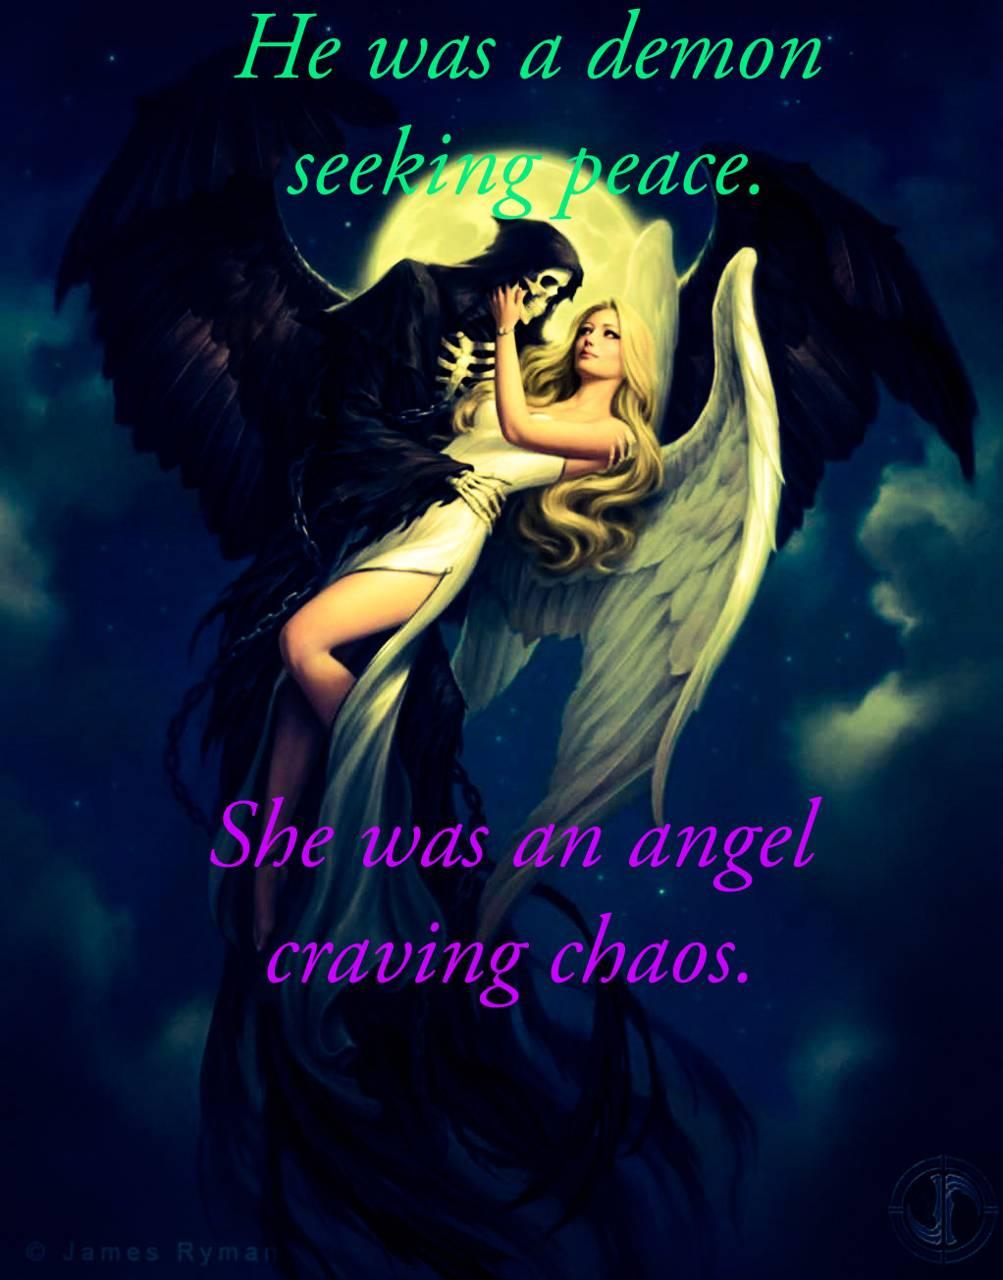 Demon And Angel Love Wallpaper By Djcmoney45 32 Free On Zedge